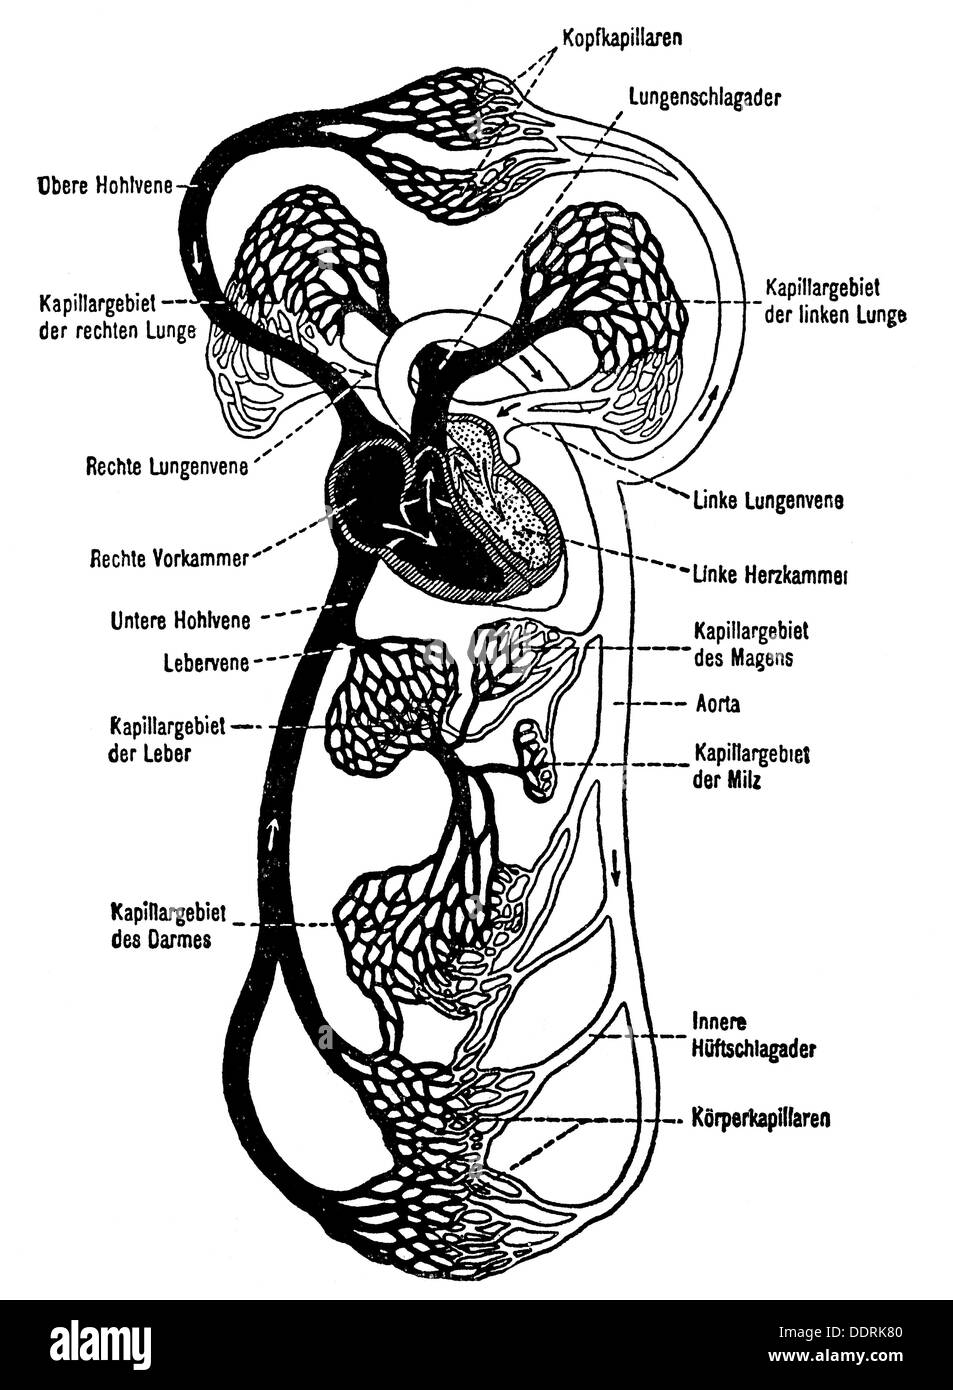 Blood Vessel Diagram Imágenes De Stock & Blood Vessel Diagram Fotos ...